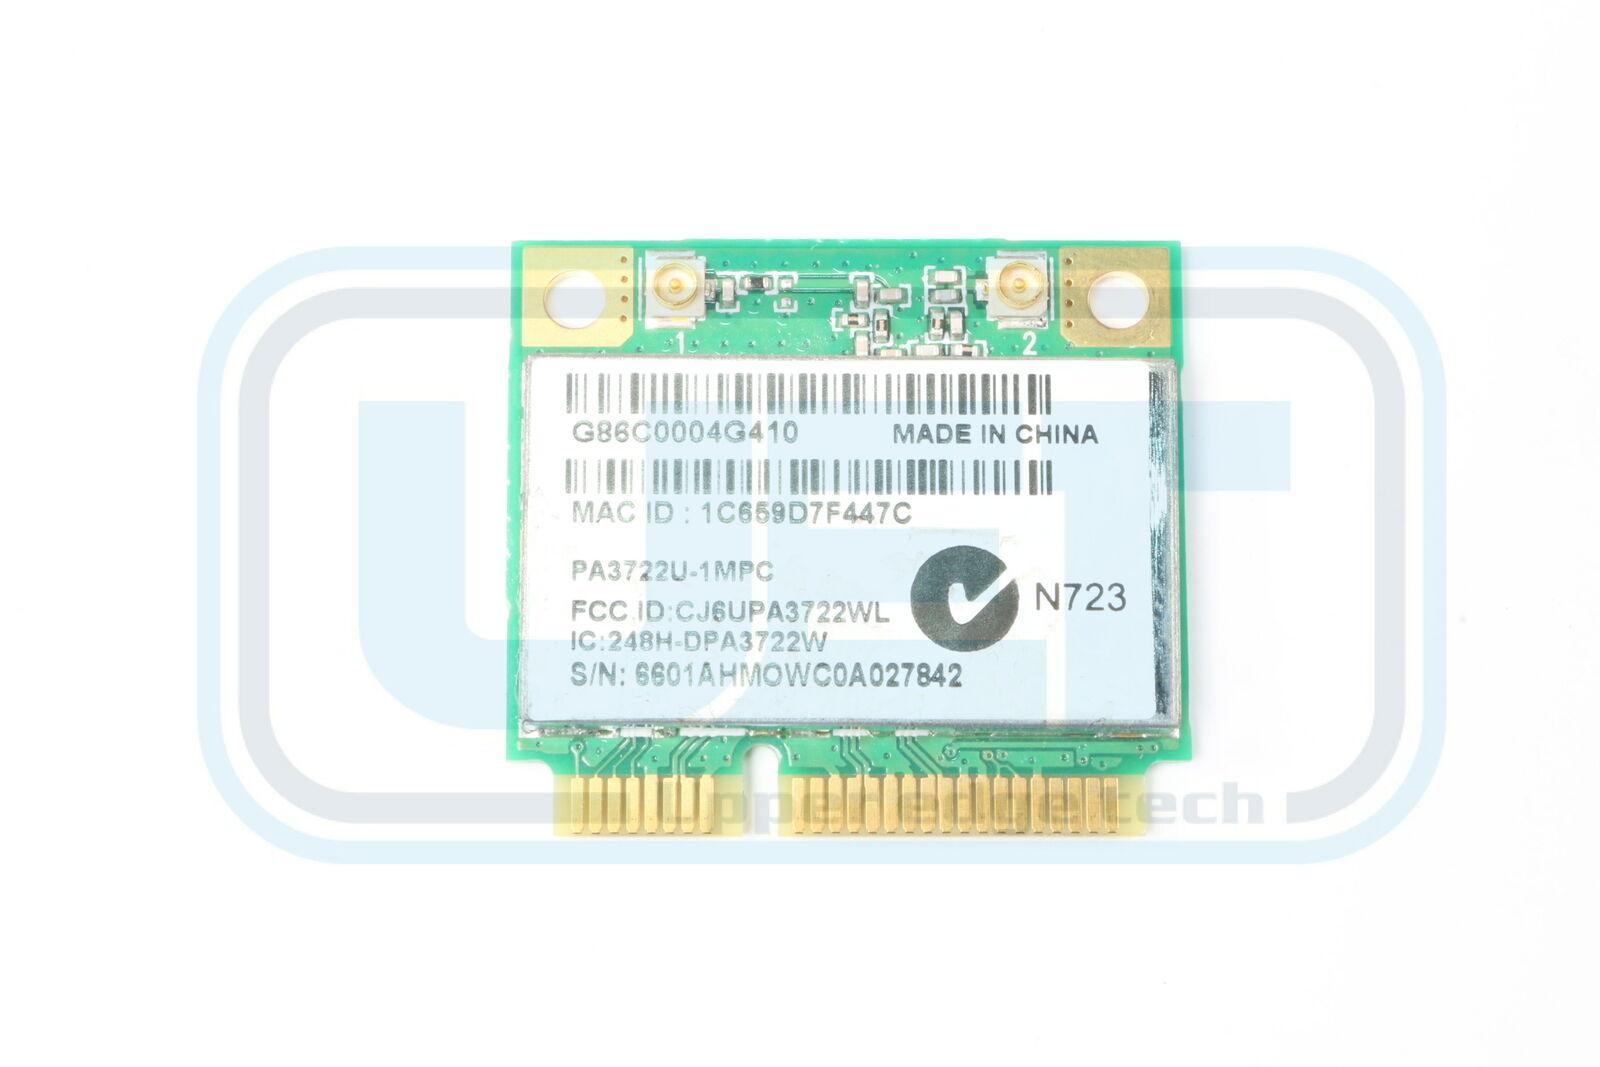 Toshiba Satellite C655D-S5084 V000180350 WLAN 802.11g Half Height Tested